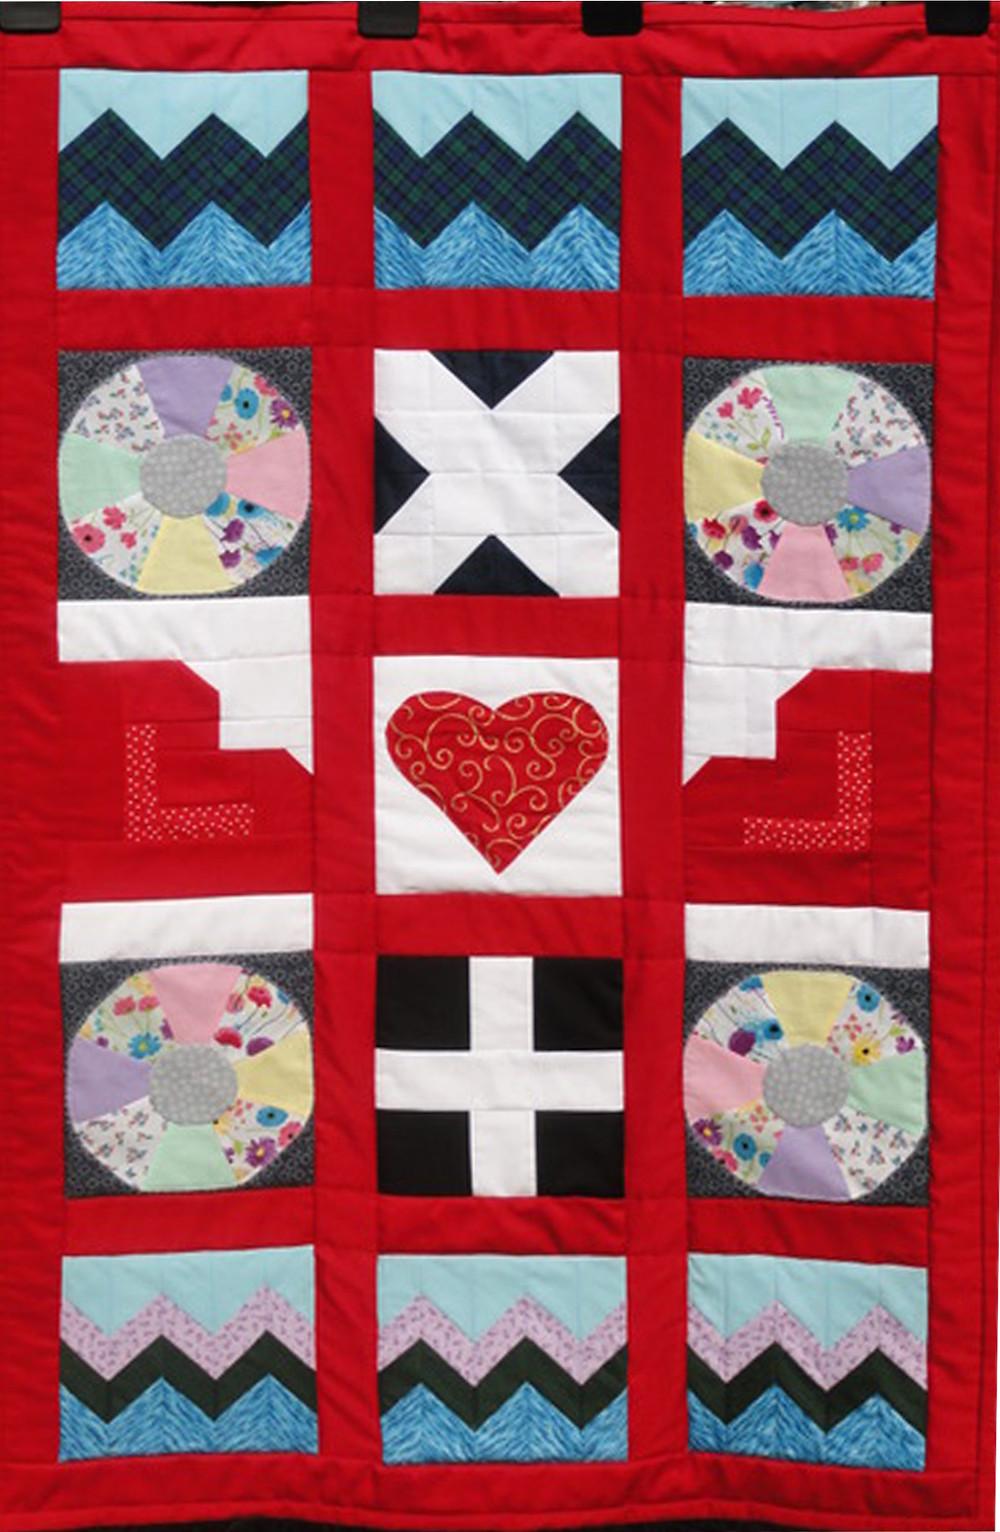 The Lejog quilt